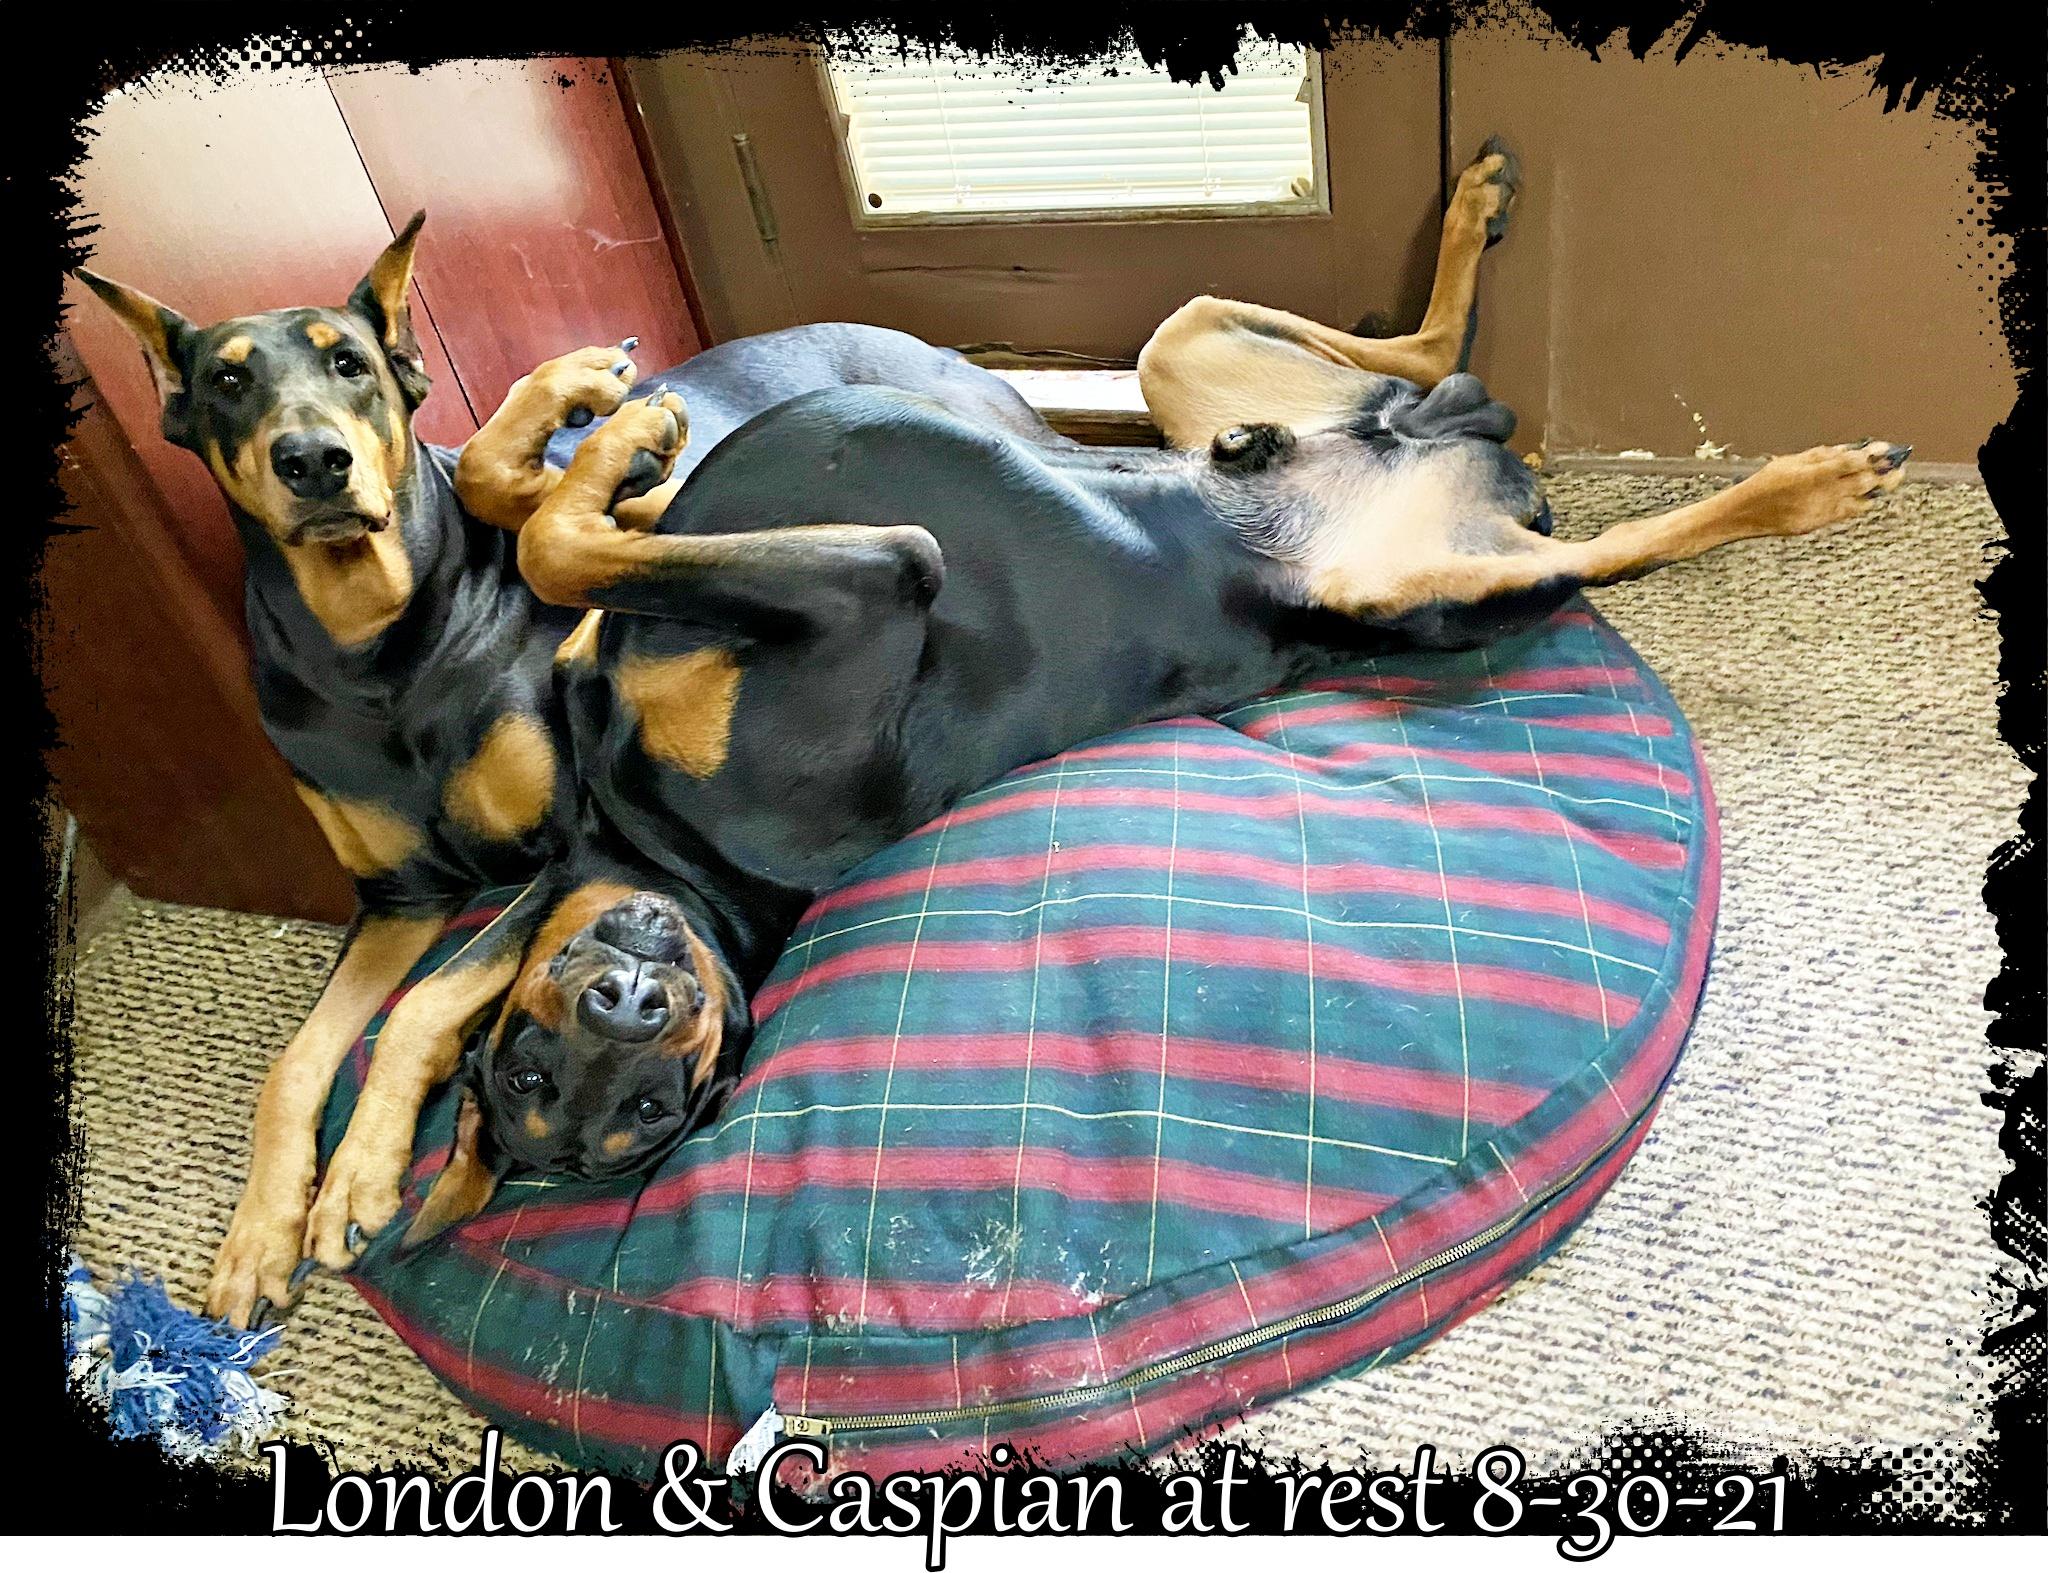 caspian-on-his-bed-img-5314.jpg